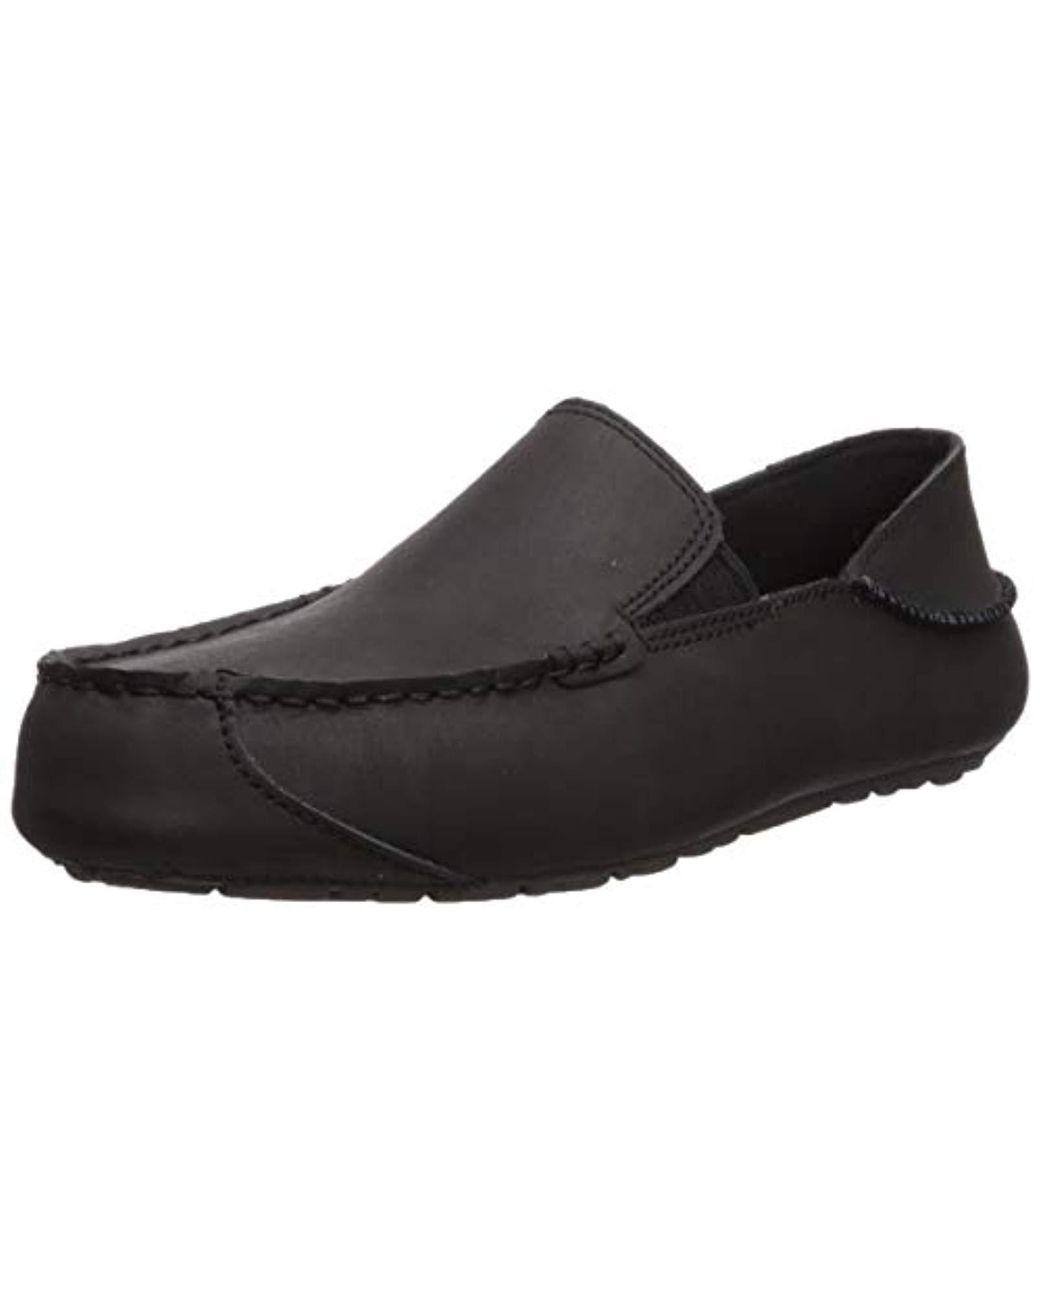 Men's Black Upshaw Slip on Loafer